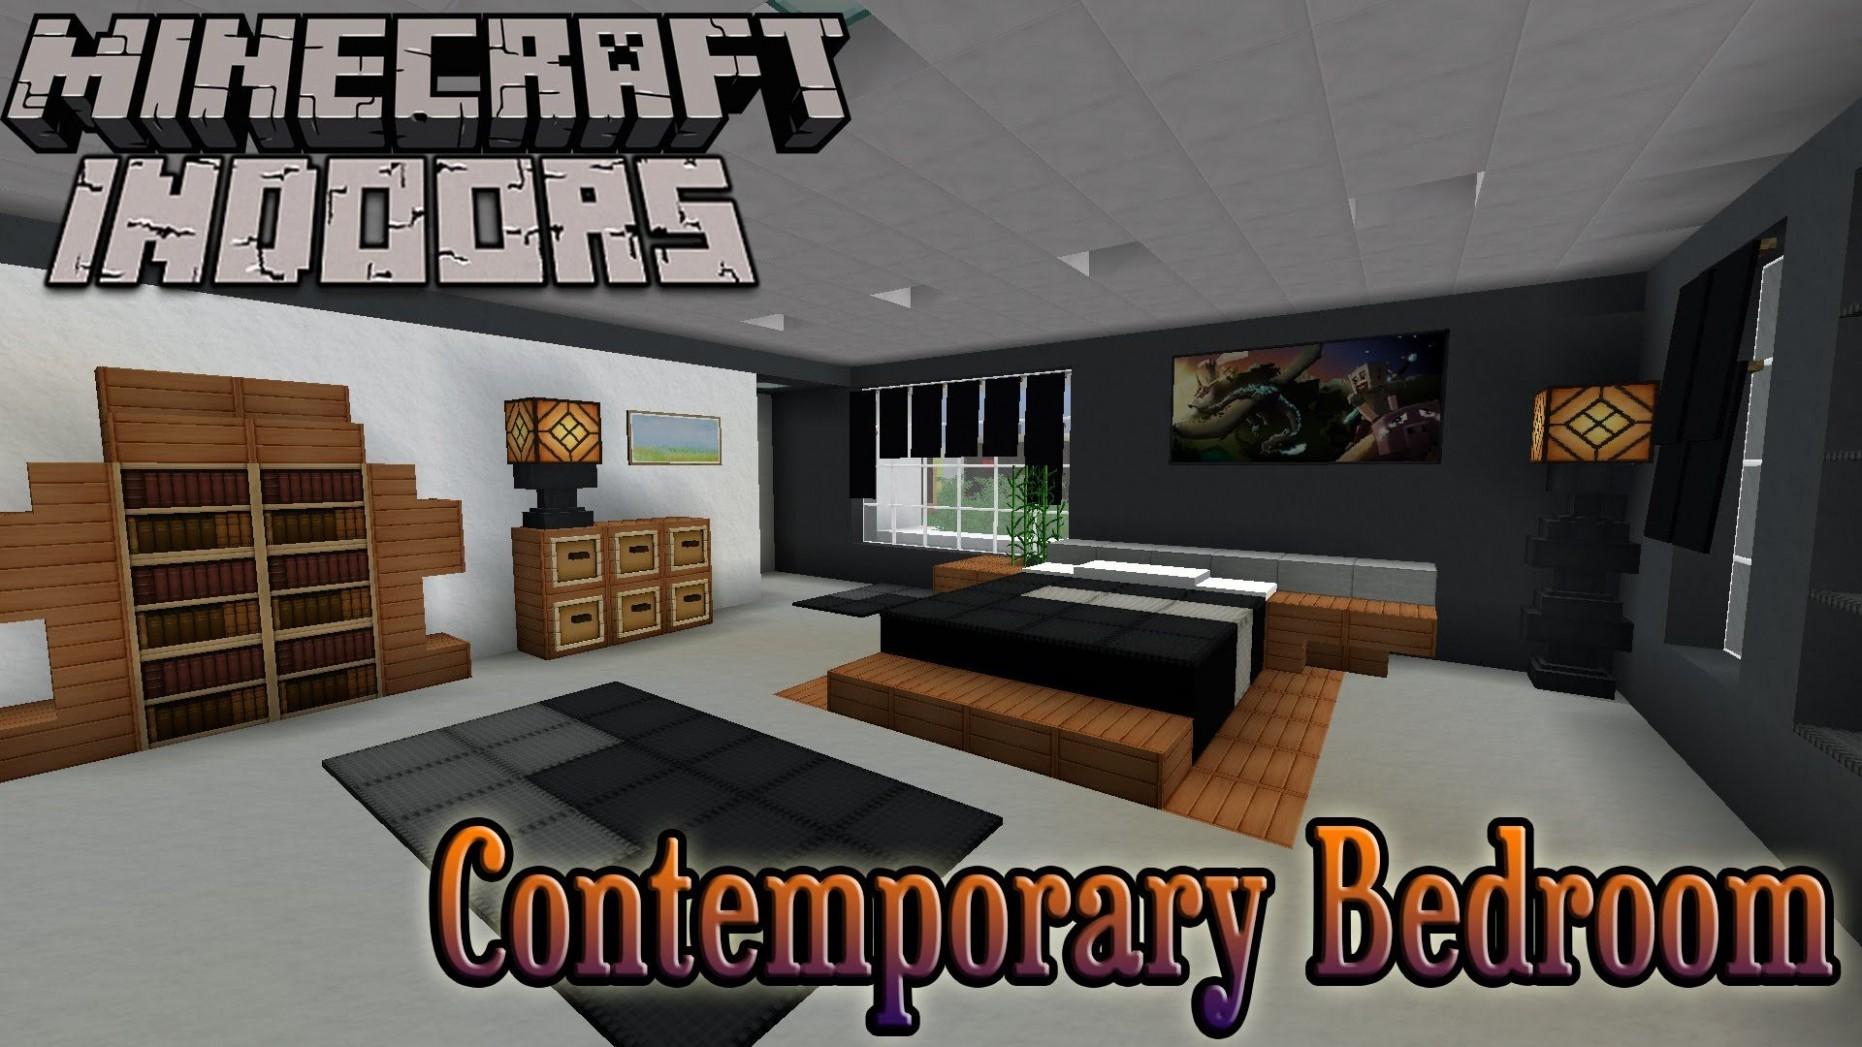 minecraft bedroom ideas - Google Search  Minecraft bedroom  - Bedroom Ideas Minecraft